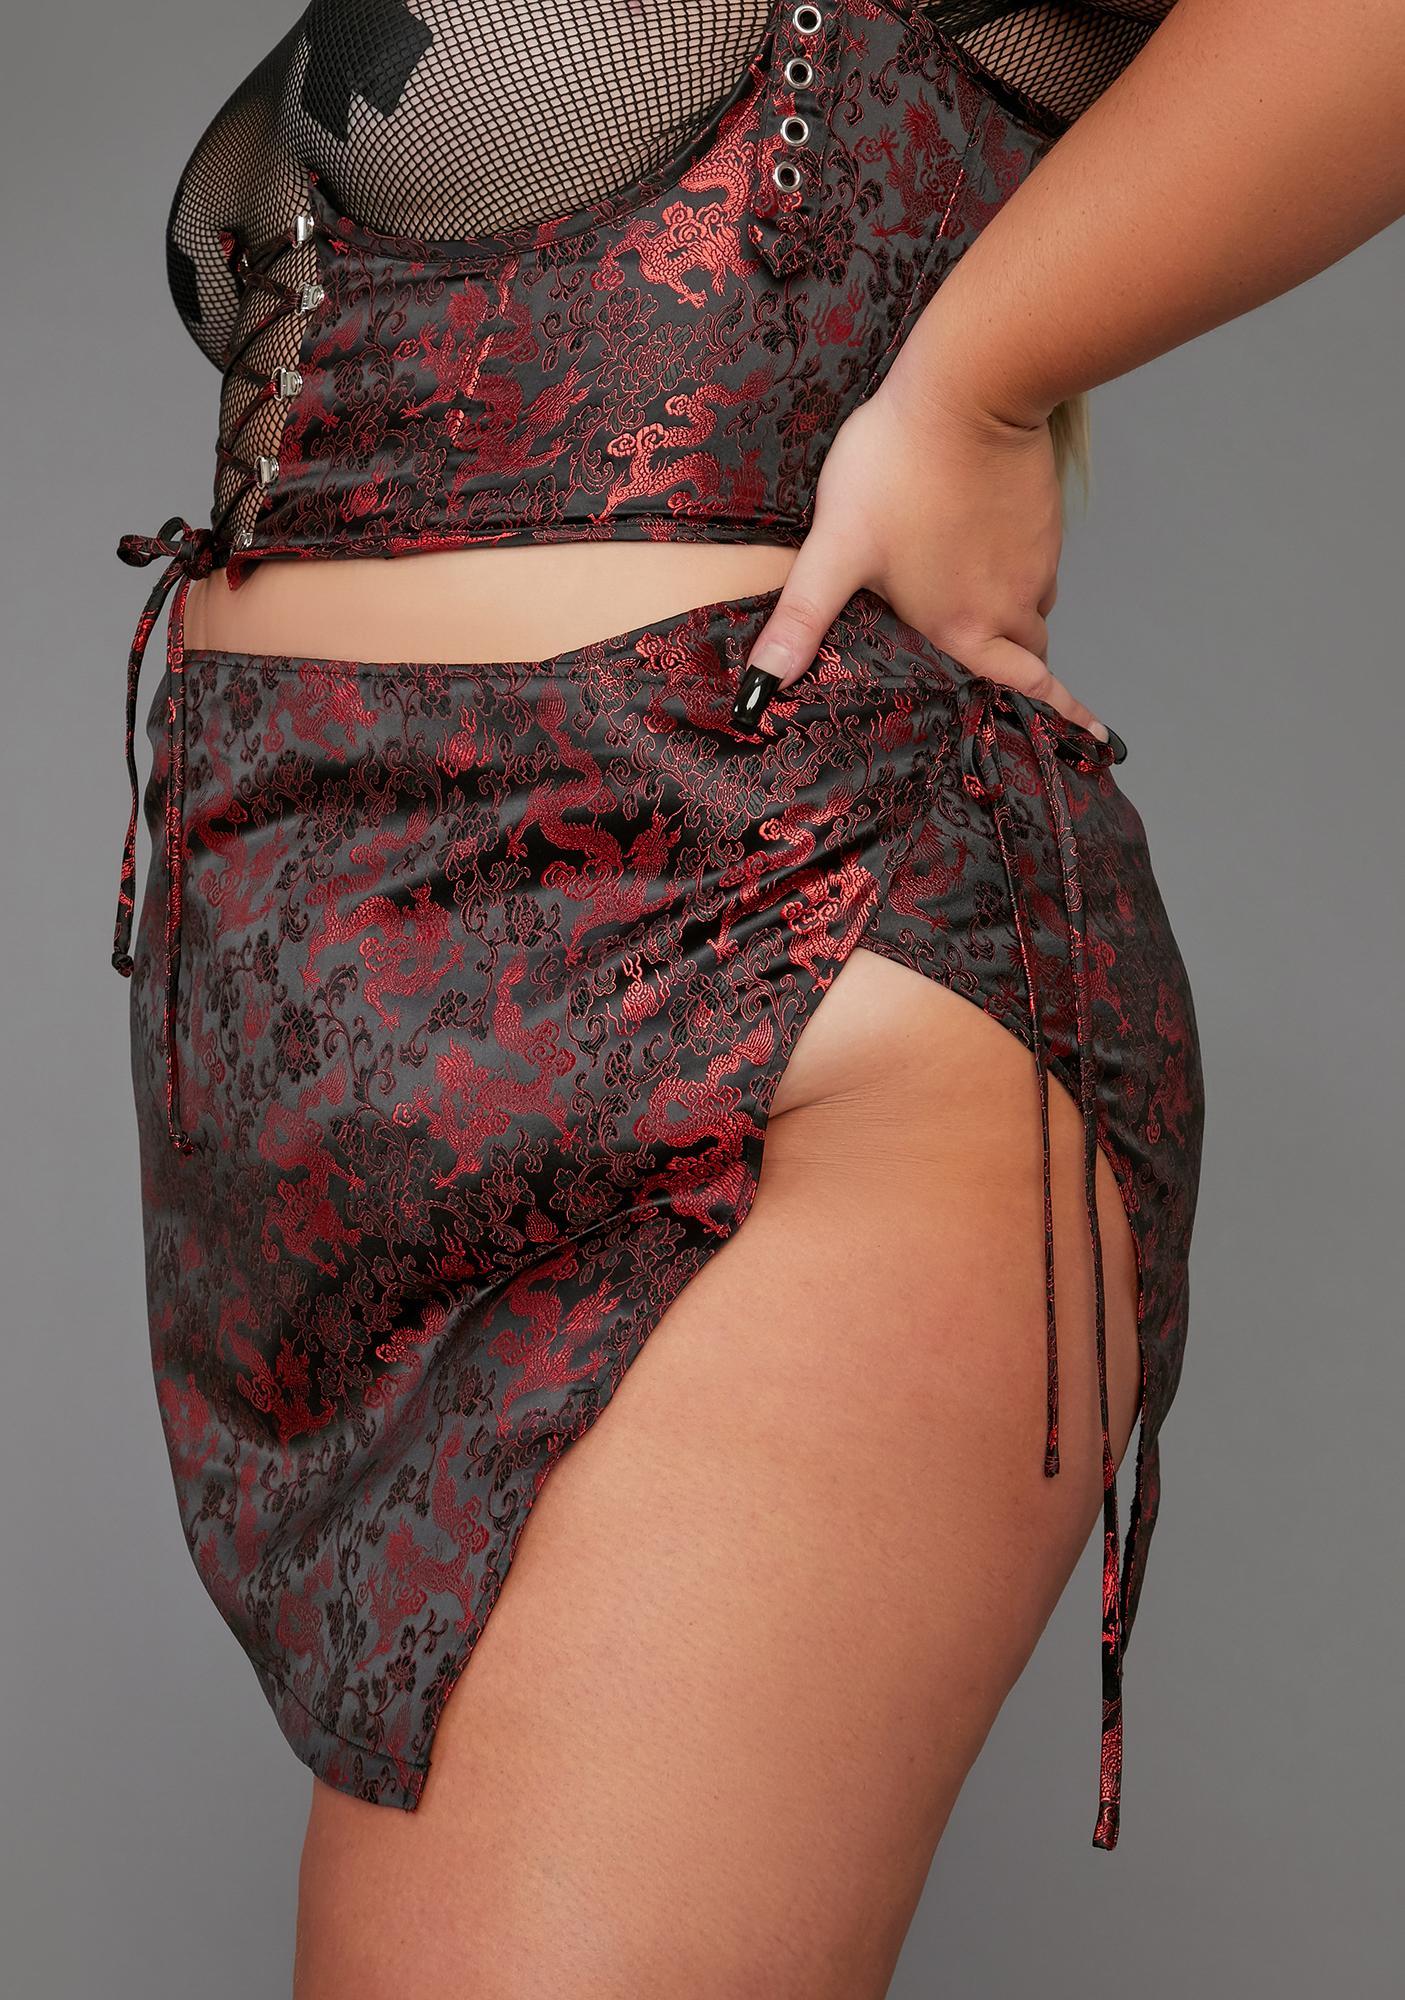 Poster Grl Infinite Clout Games Wrap Skirt